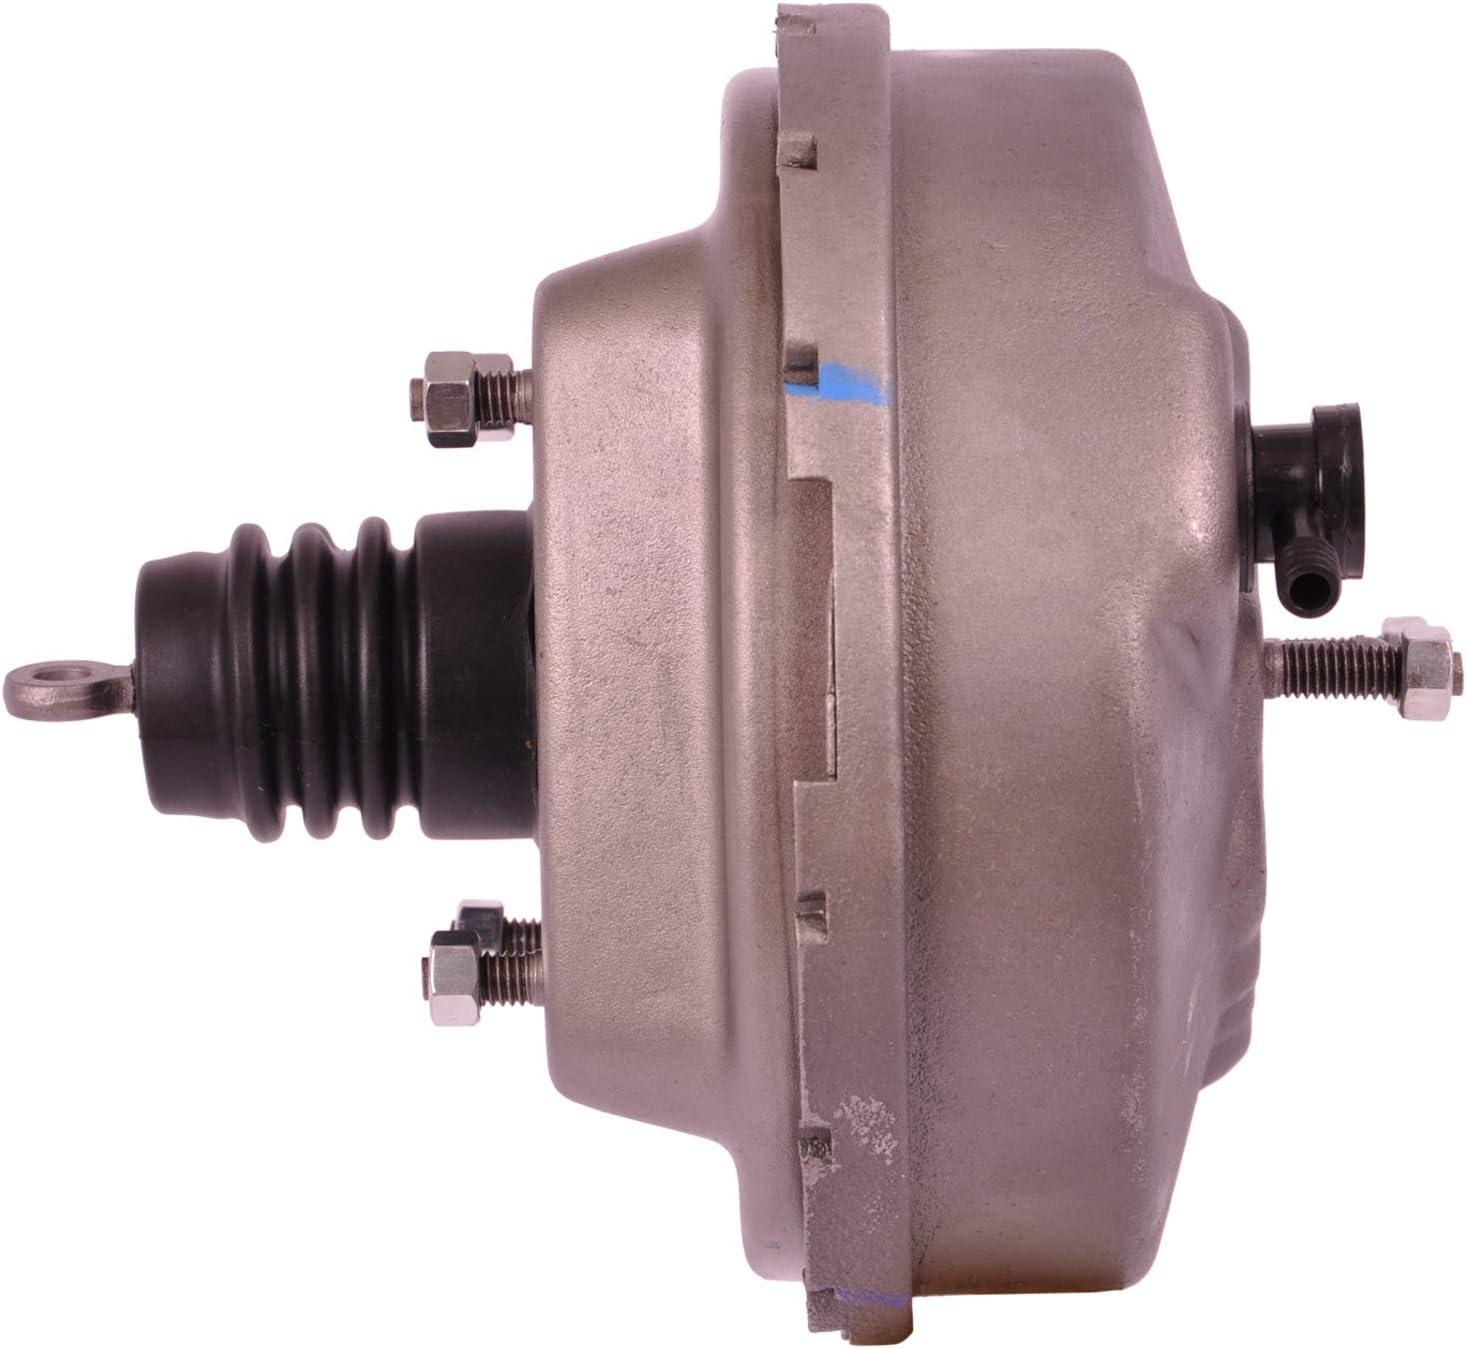 Cardone 54-73510 Remanufactured 激安格安割引情報満載 Vacuum Booster Brake 新作通販 Power witho